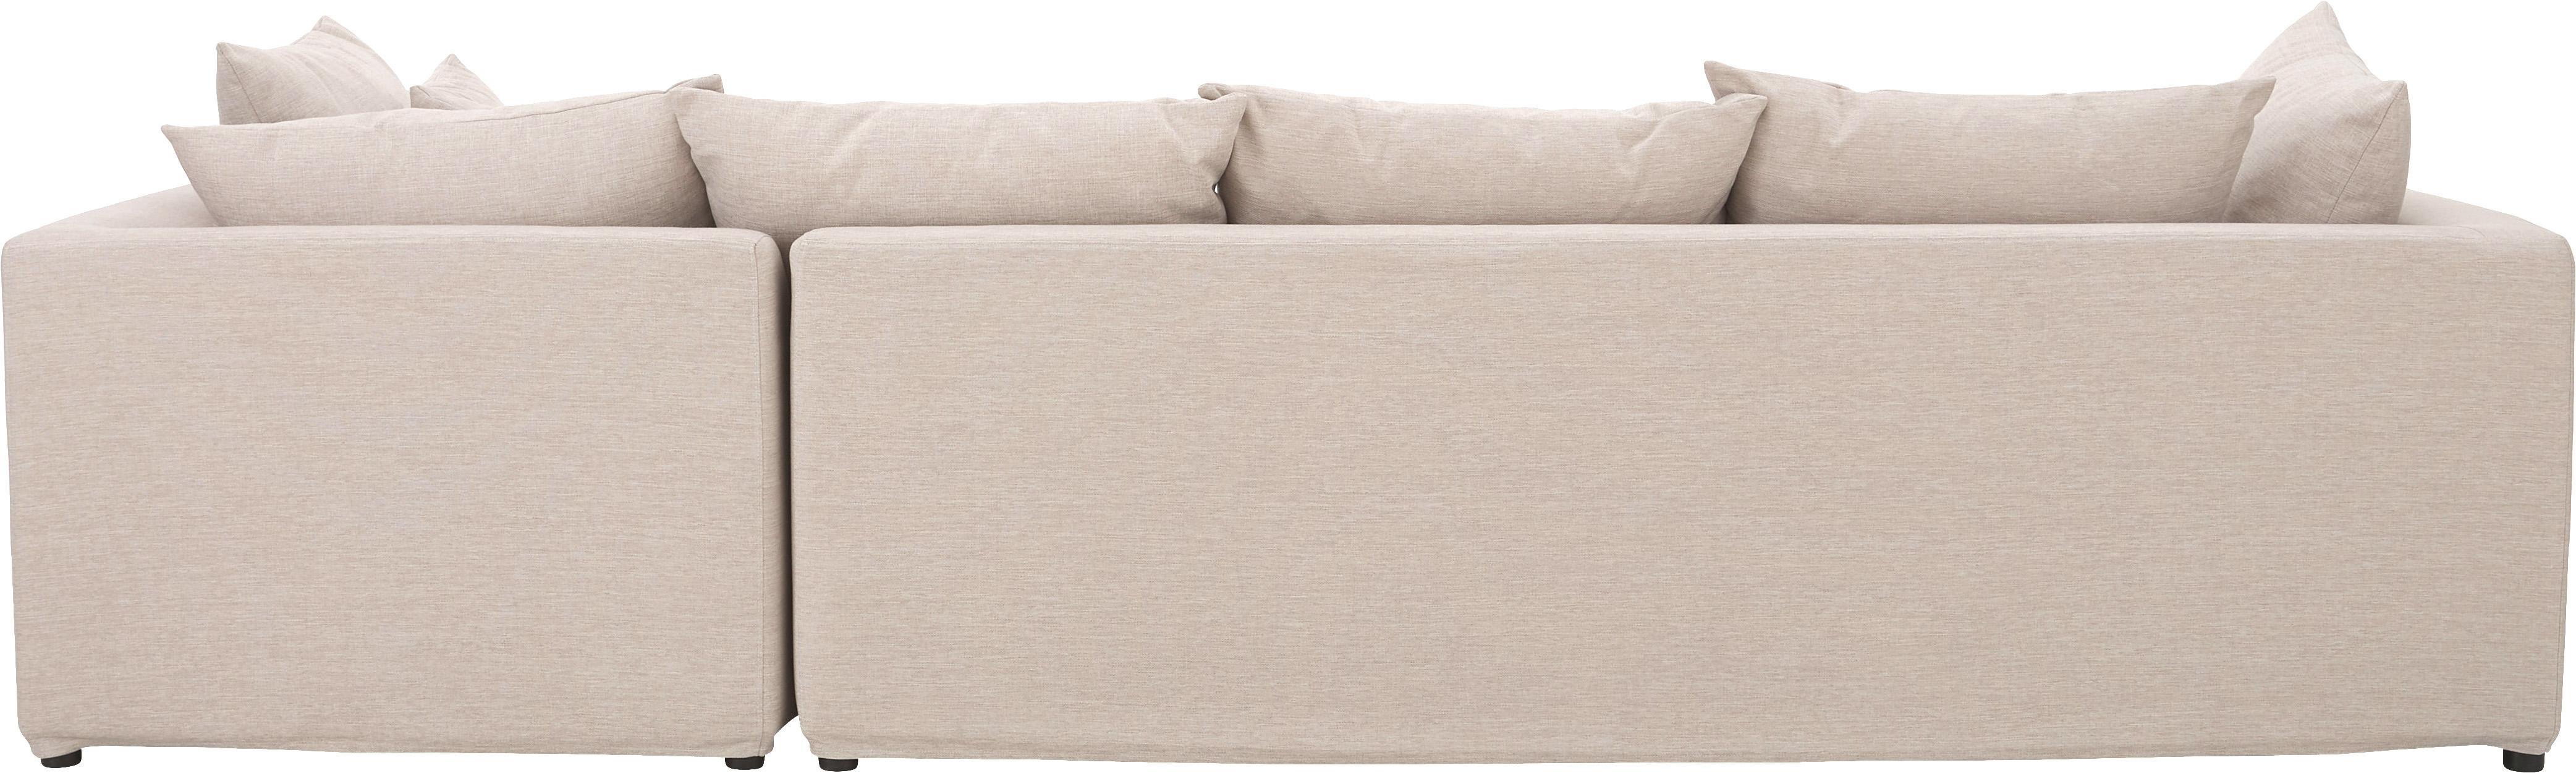 Ecksofa Zach, Bezug: Polypropylen, Füße: Kunststoff, Webstoff Beige, B 300 x T 213 cm